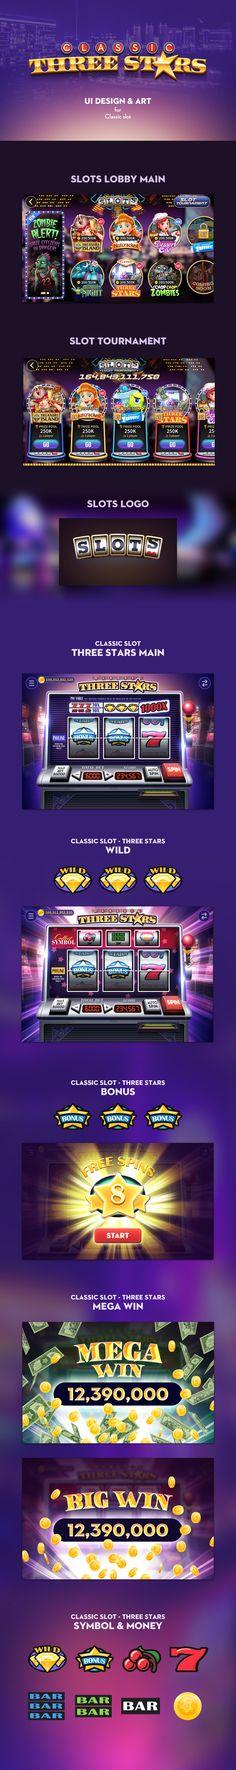 free online casino slots cleopatra